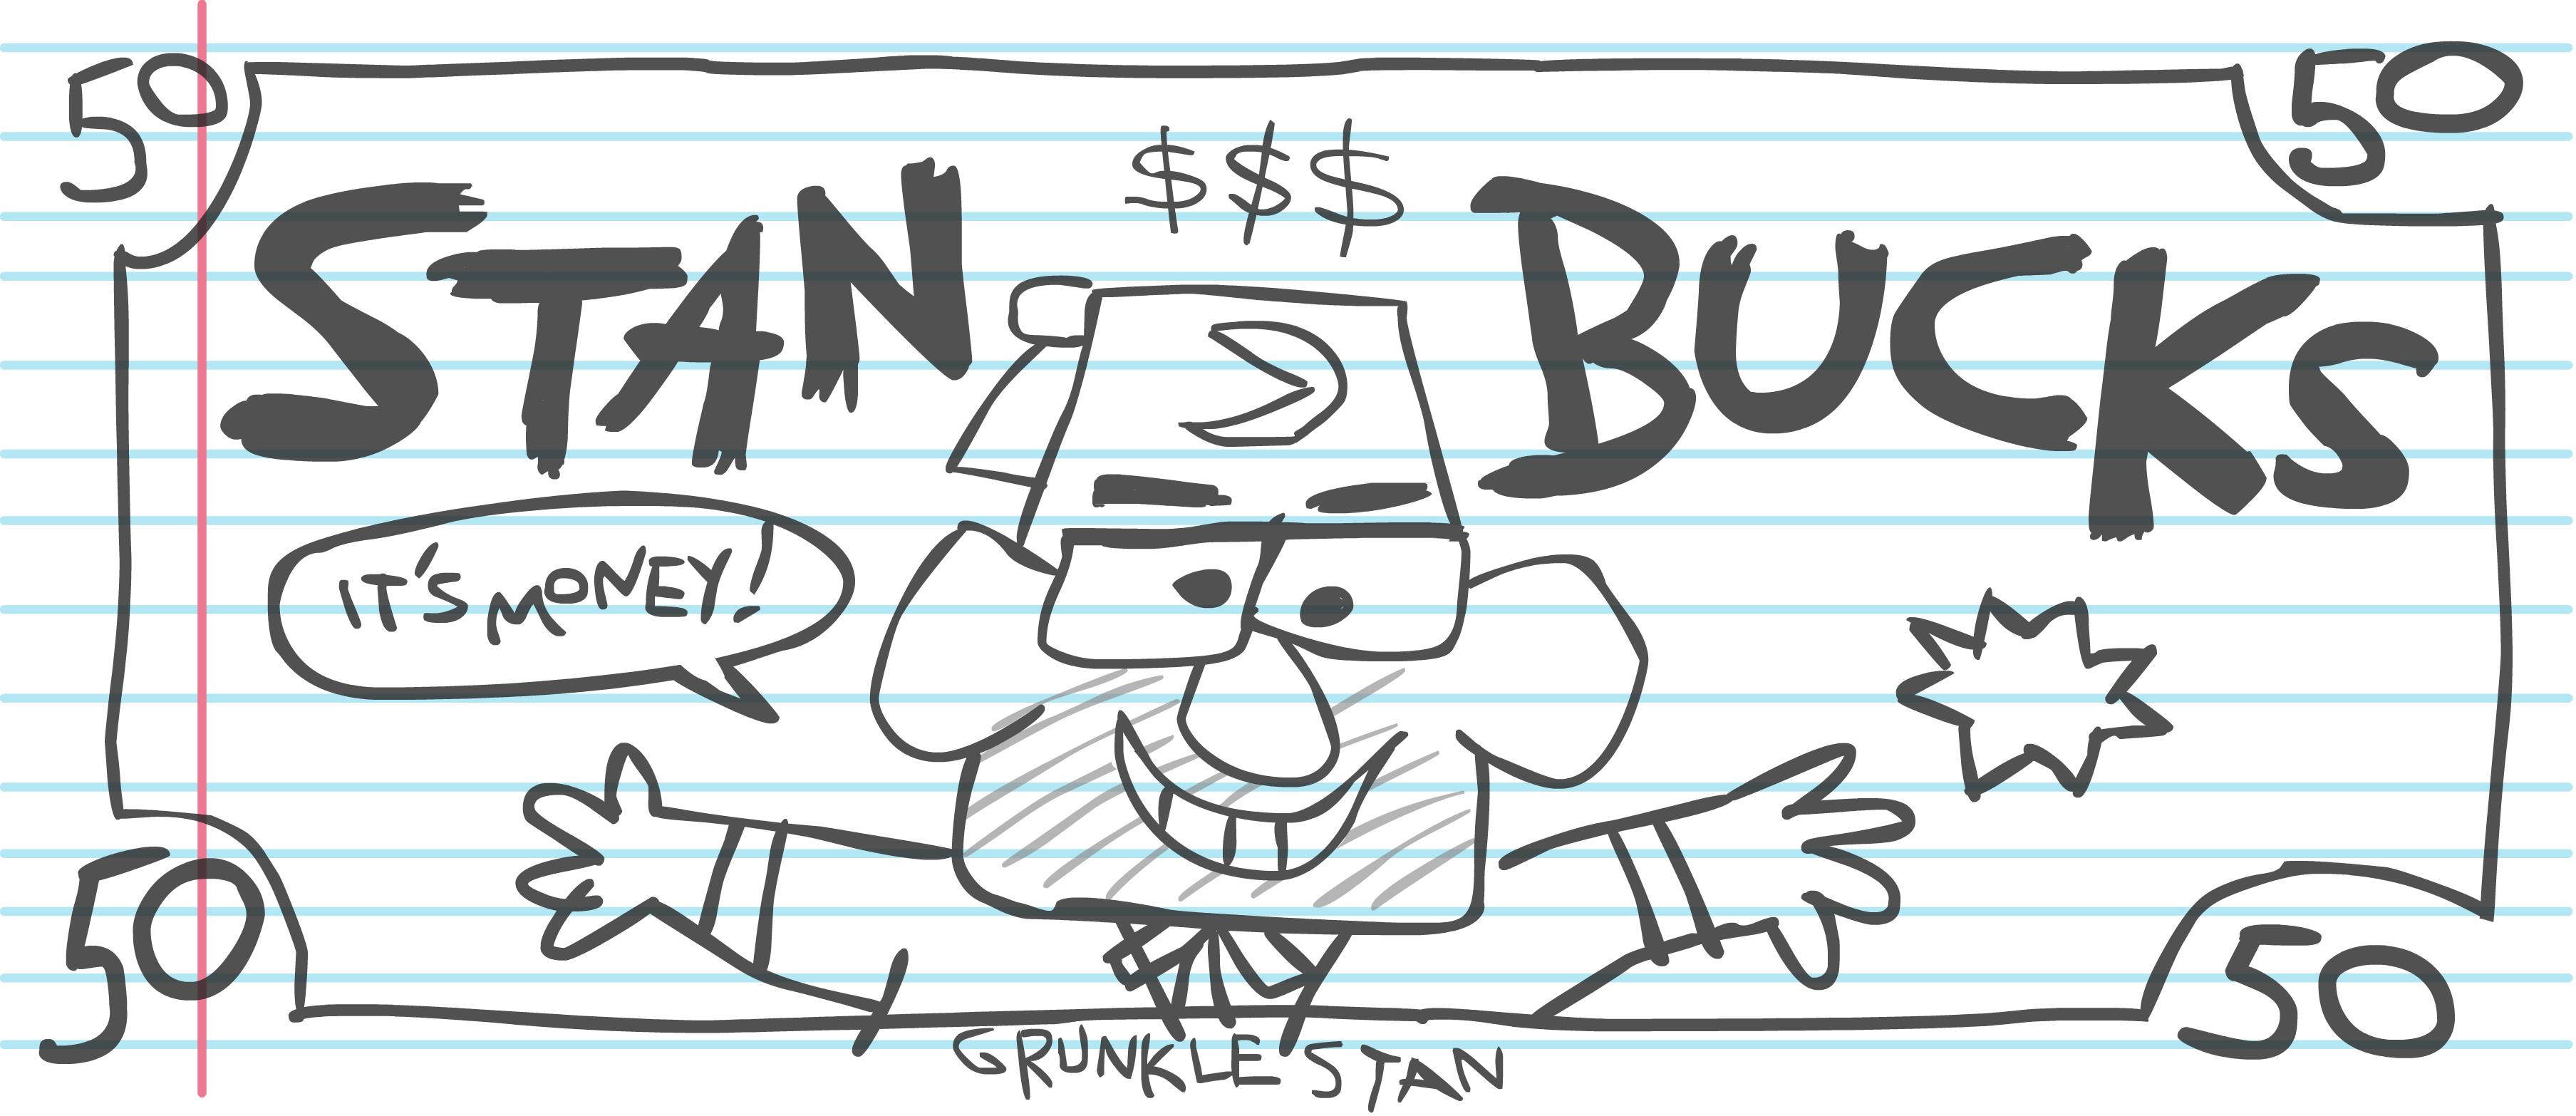 Stan Bucks It S Money R Gravityfalls Gravity Falls Journal Gravity Falls Fan Art Gravity Falls